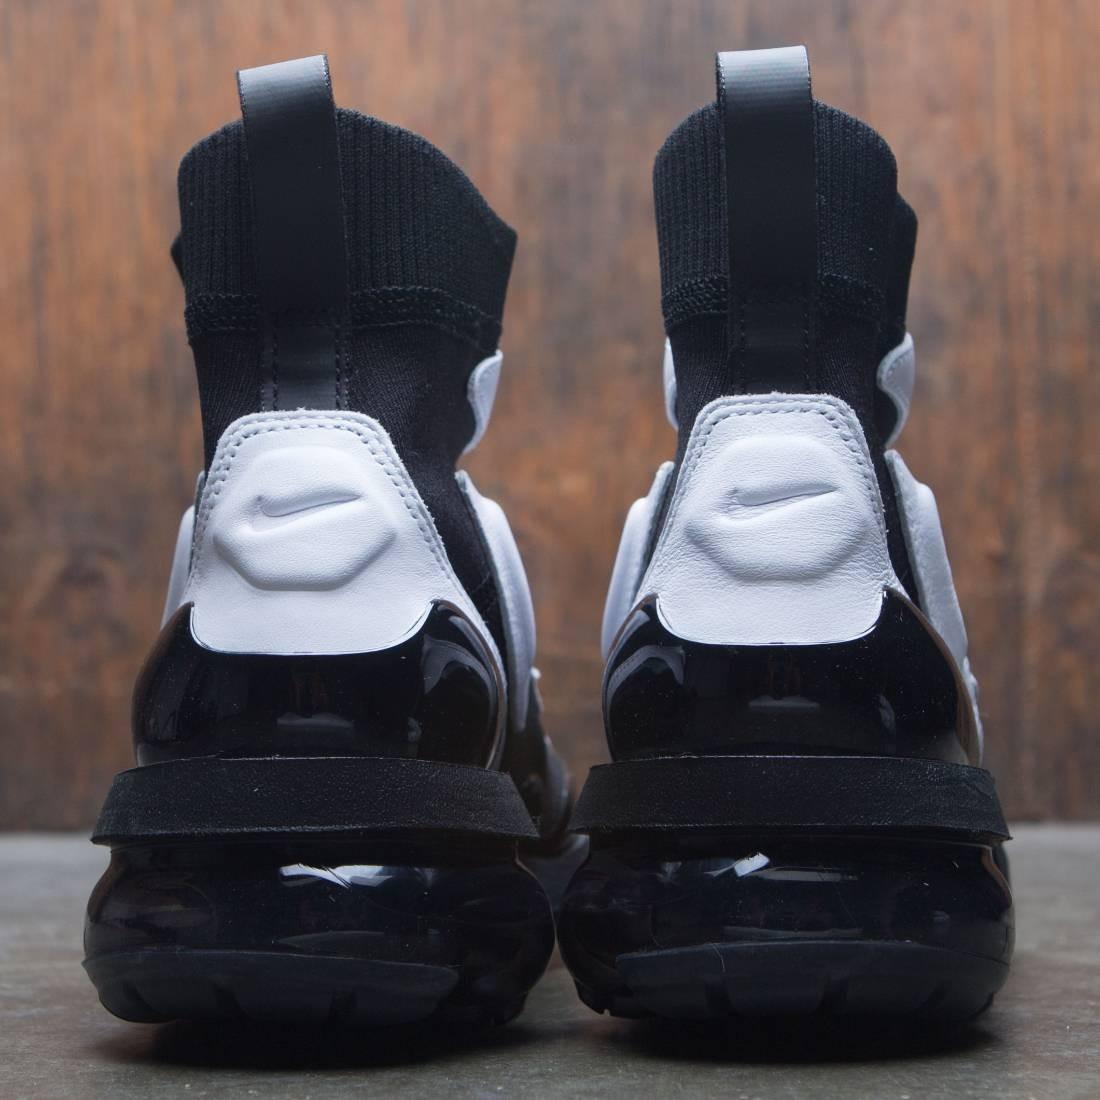 separation shoes 3f54a b6c50 Nike Women Air Vapormax Light Ii (black   white-anthracite)